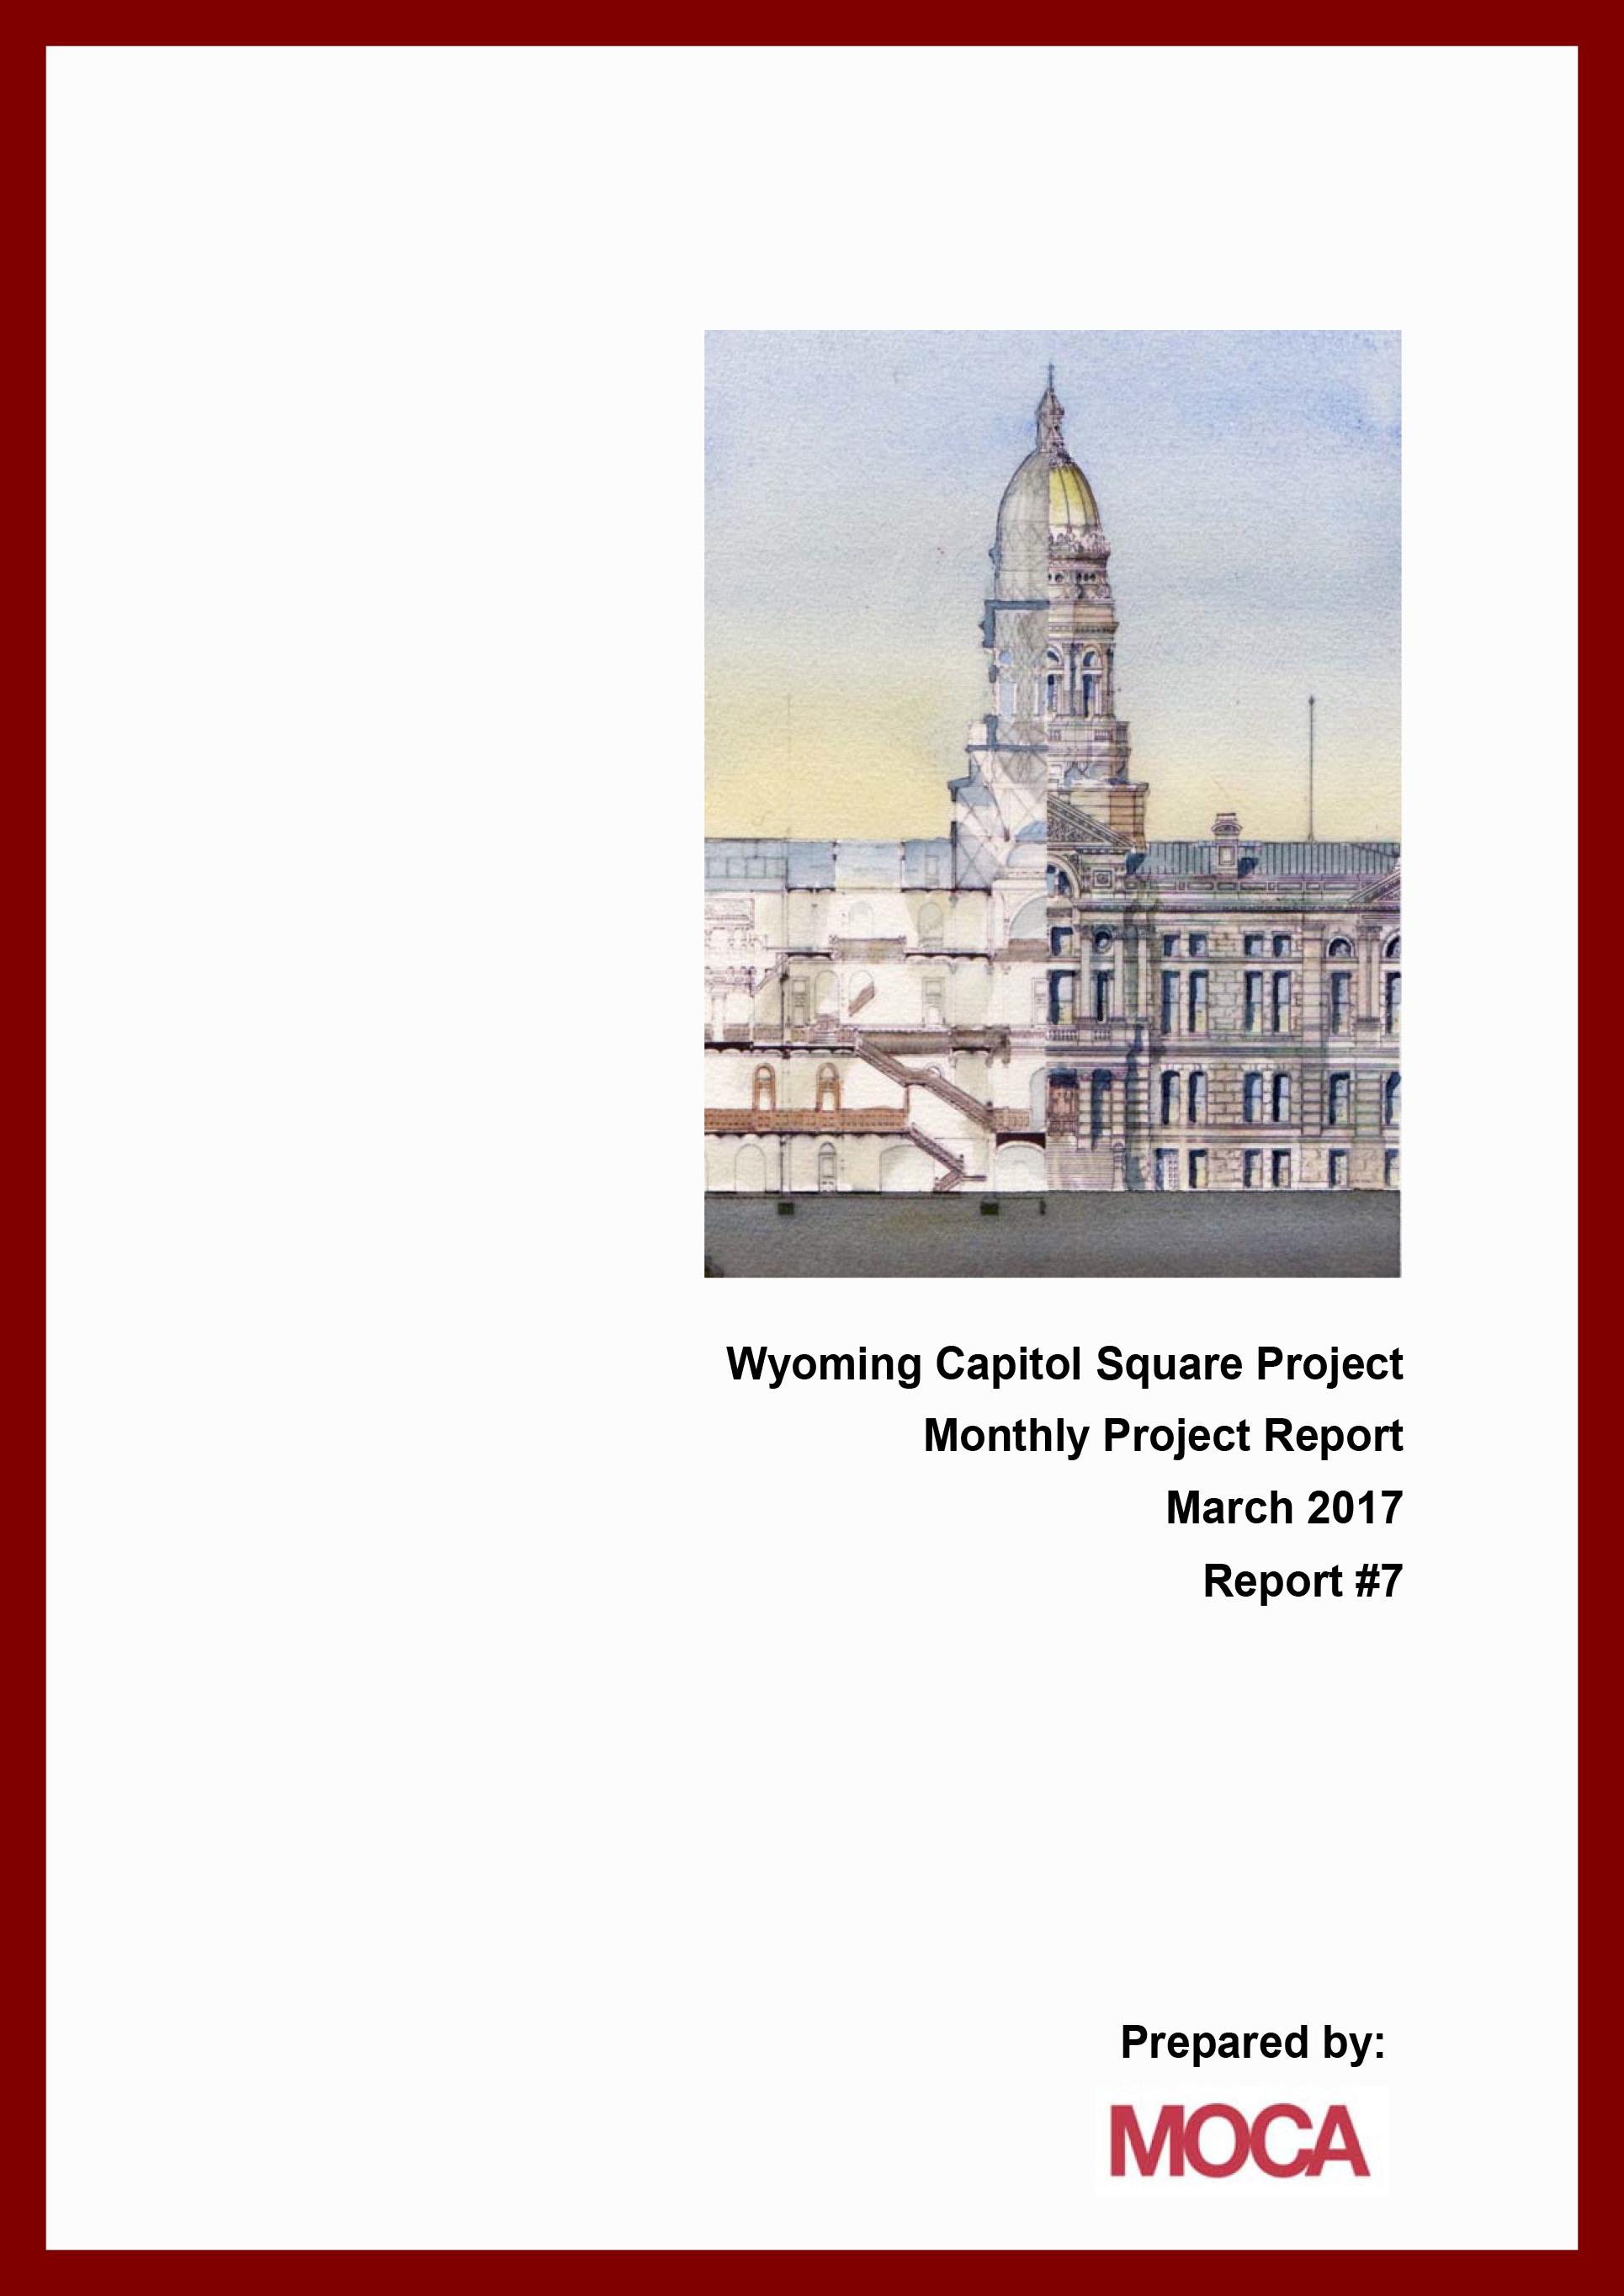 2017-0502-WyomingCapitolMonthlyReport-Final-7.jpg